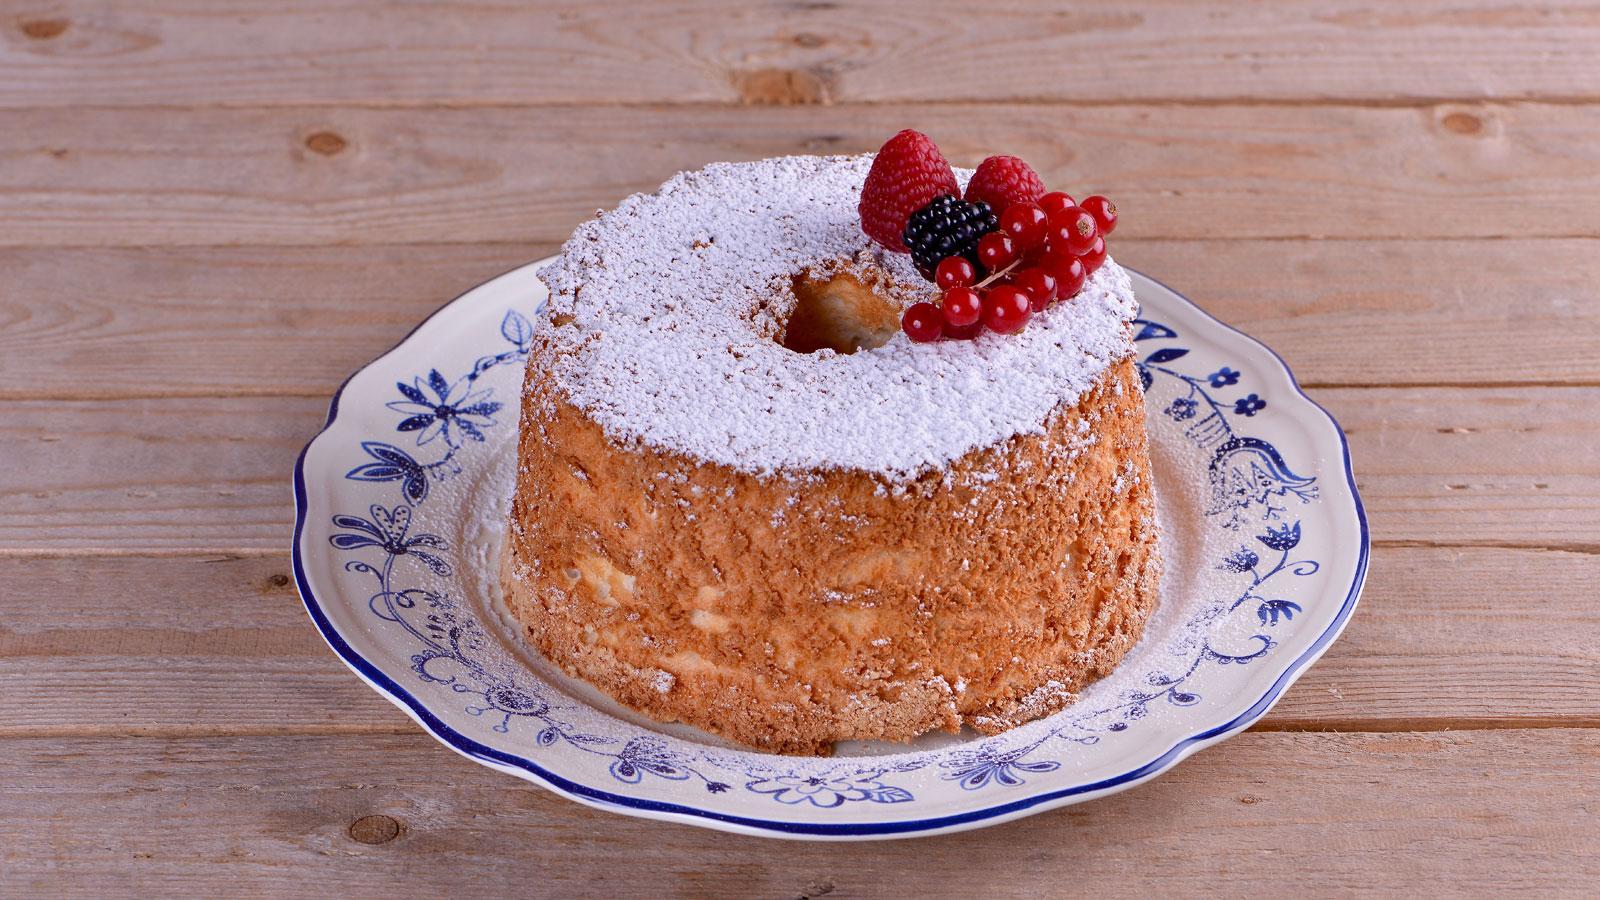 Angel food cake alma obreg n receta canal cocina for Canal cocina alma obregon